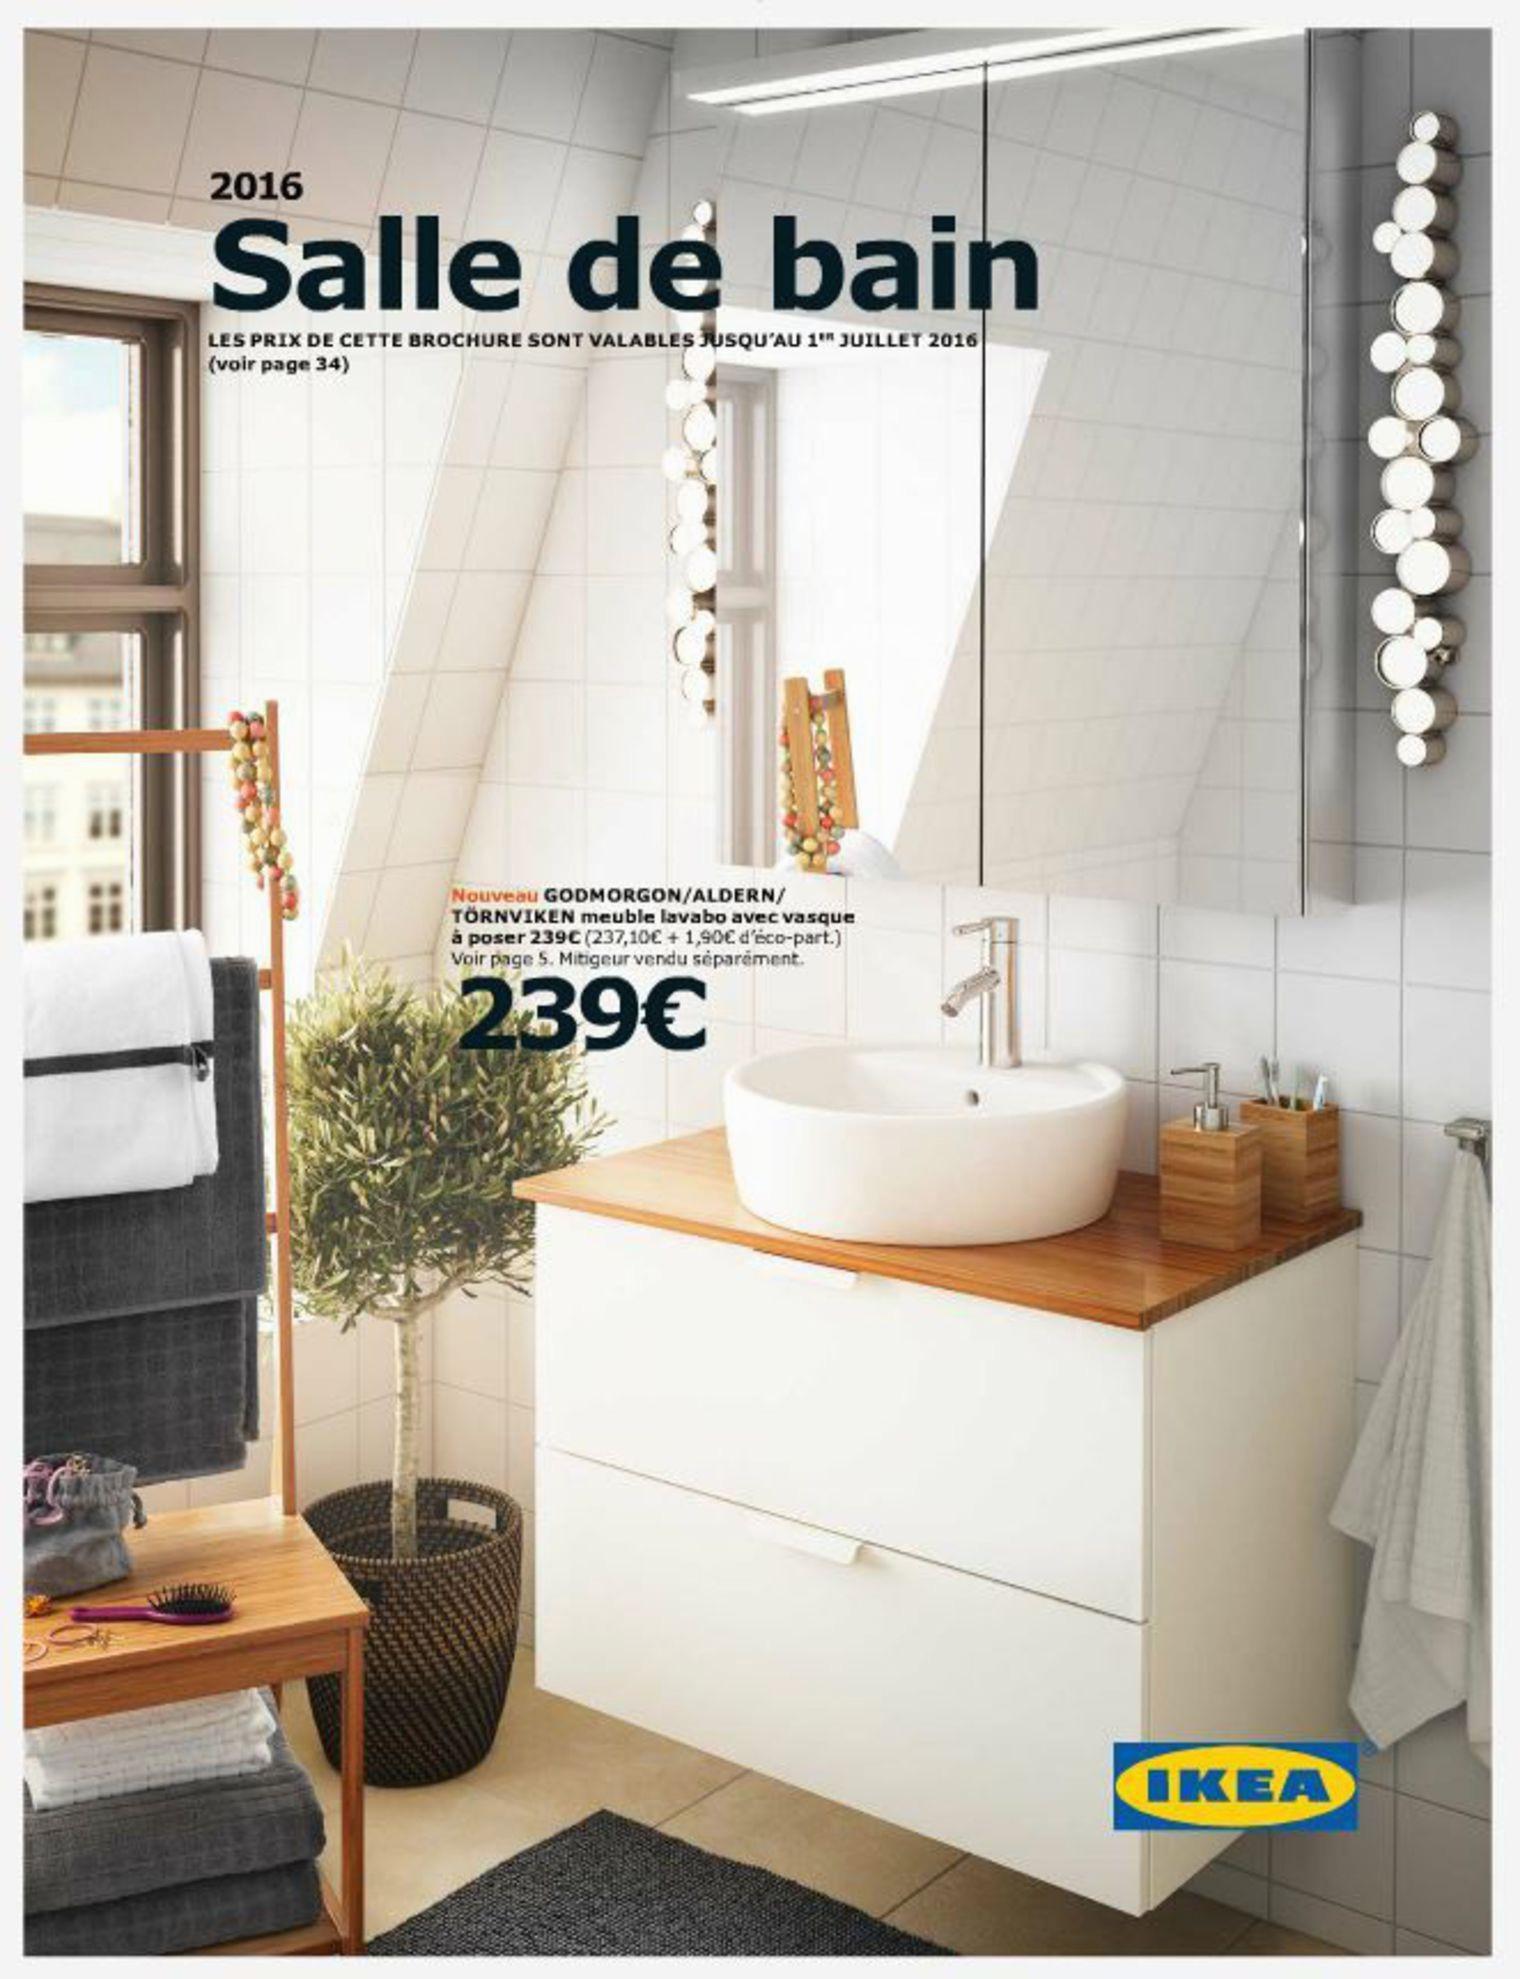 Applique Salle De Bain Ikea Impressionnant Photographie 20 Beau Colonne De Salle De Bain Ikea Bain